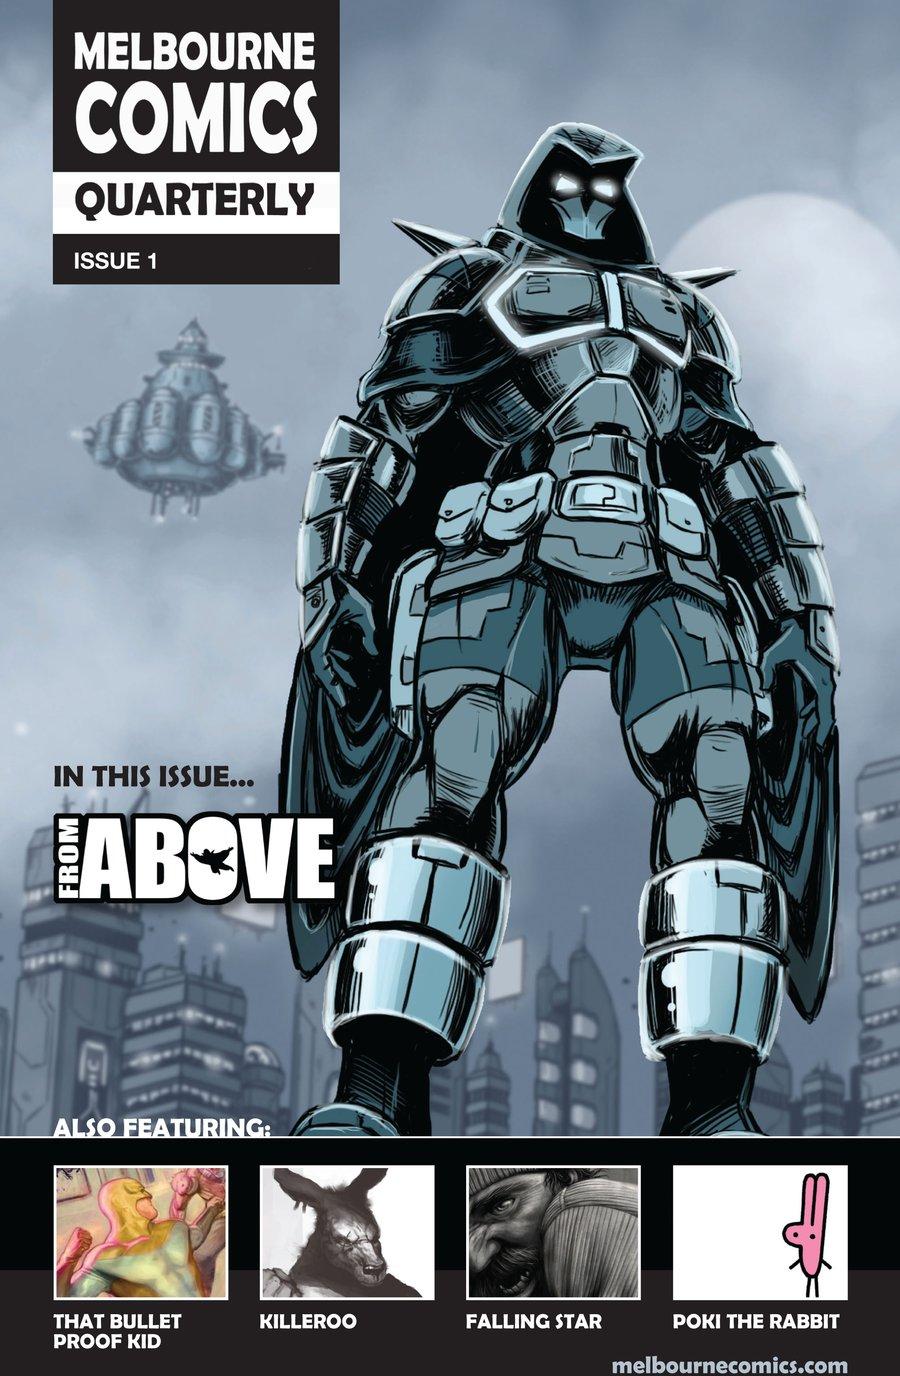 Image of Melbourne Comics Quarterly #1